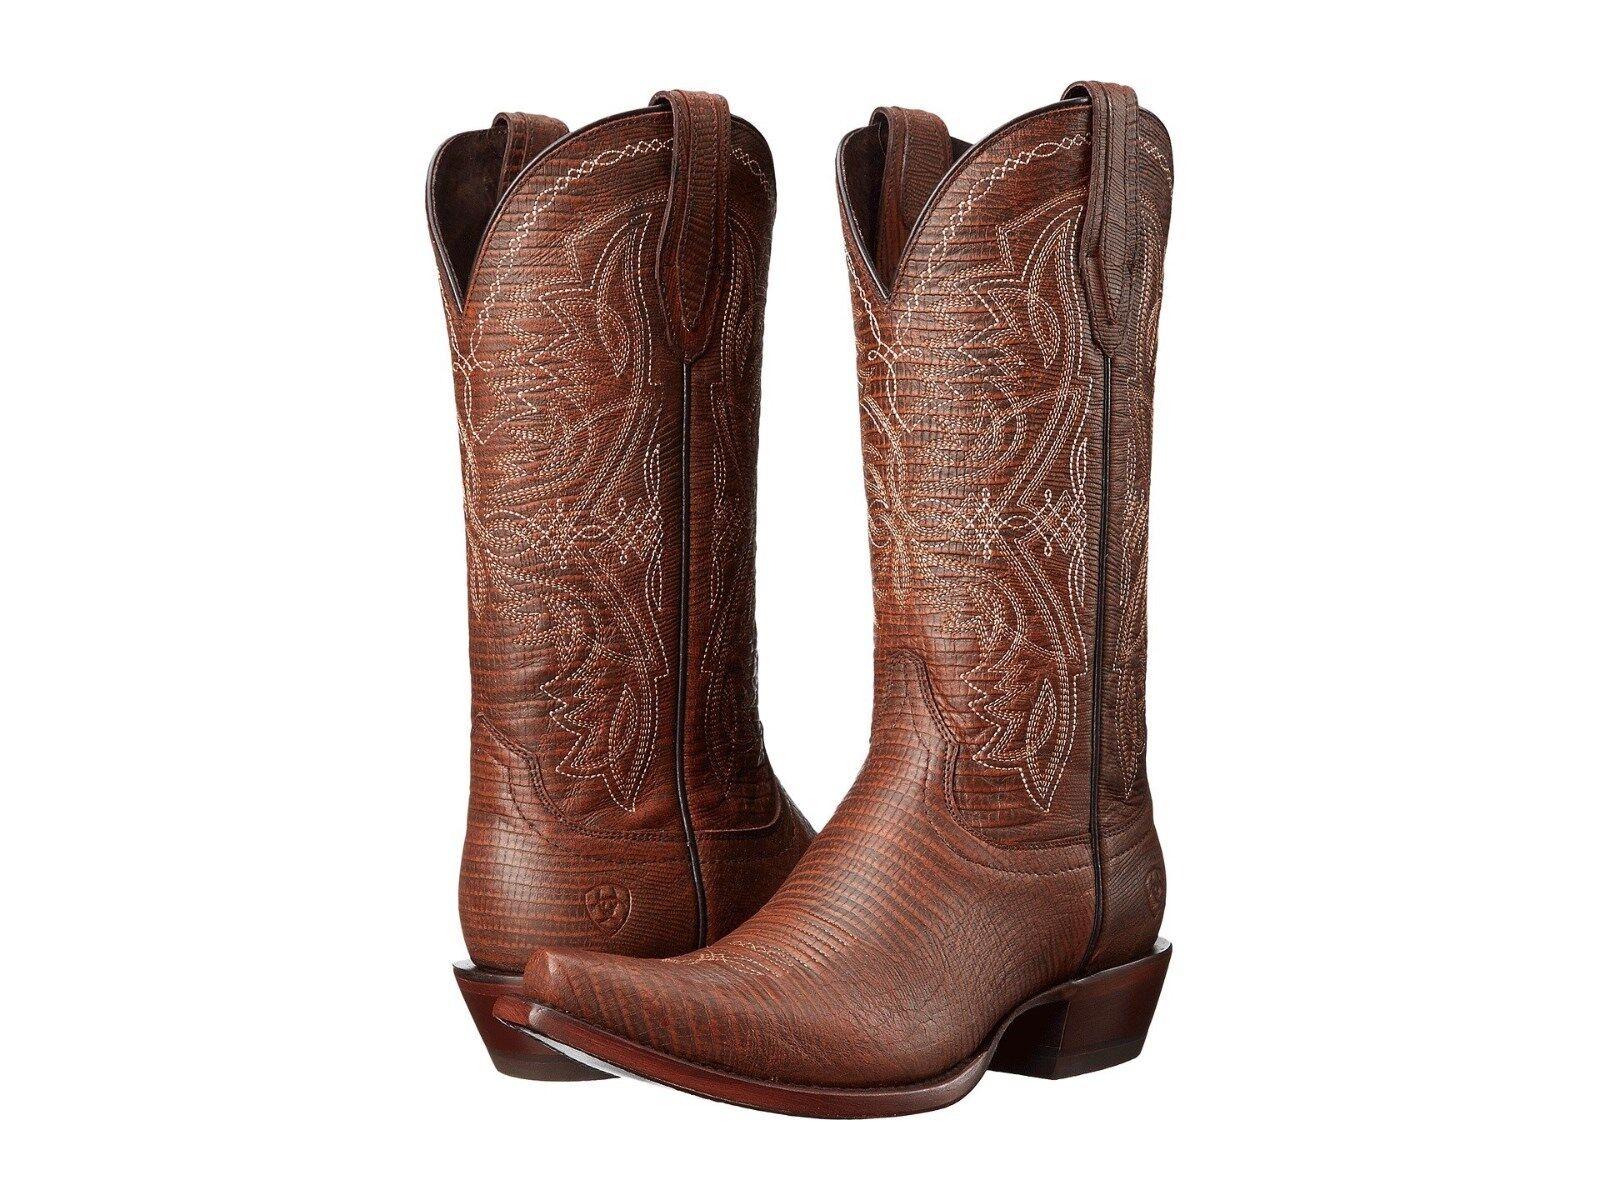 Ariat Alamar   Womens Boots  Chocolate Chocolate Chocolate Lizard Print Leather  8.5  NIB c9cb32